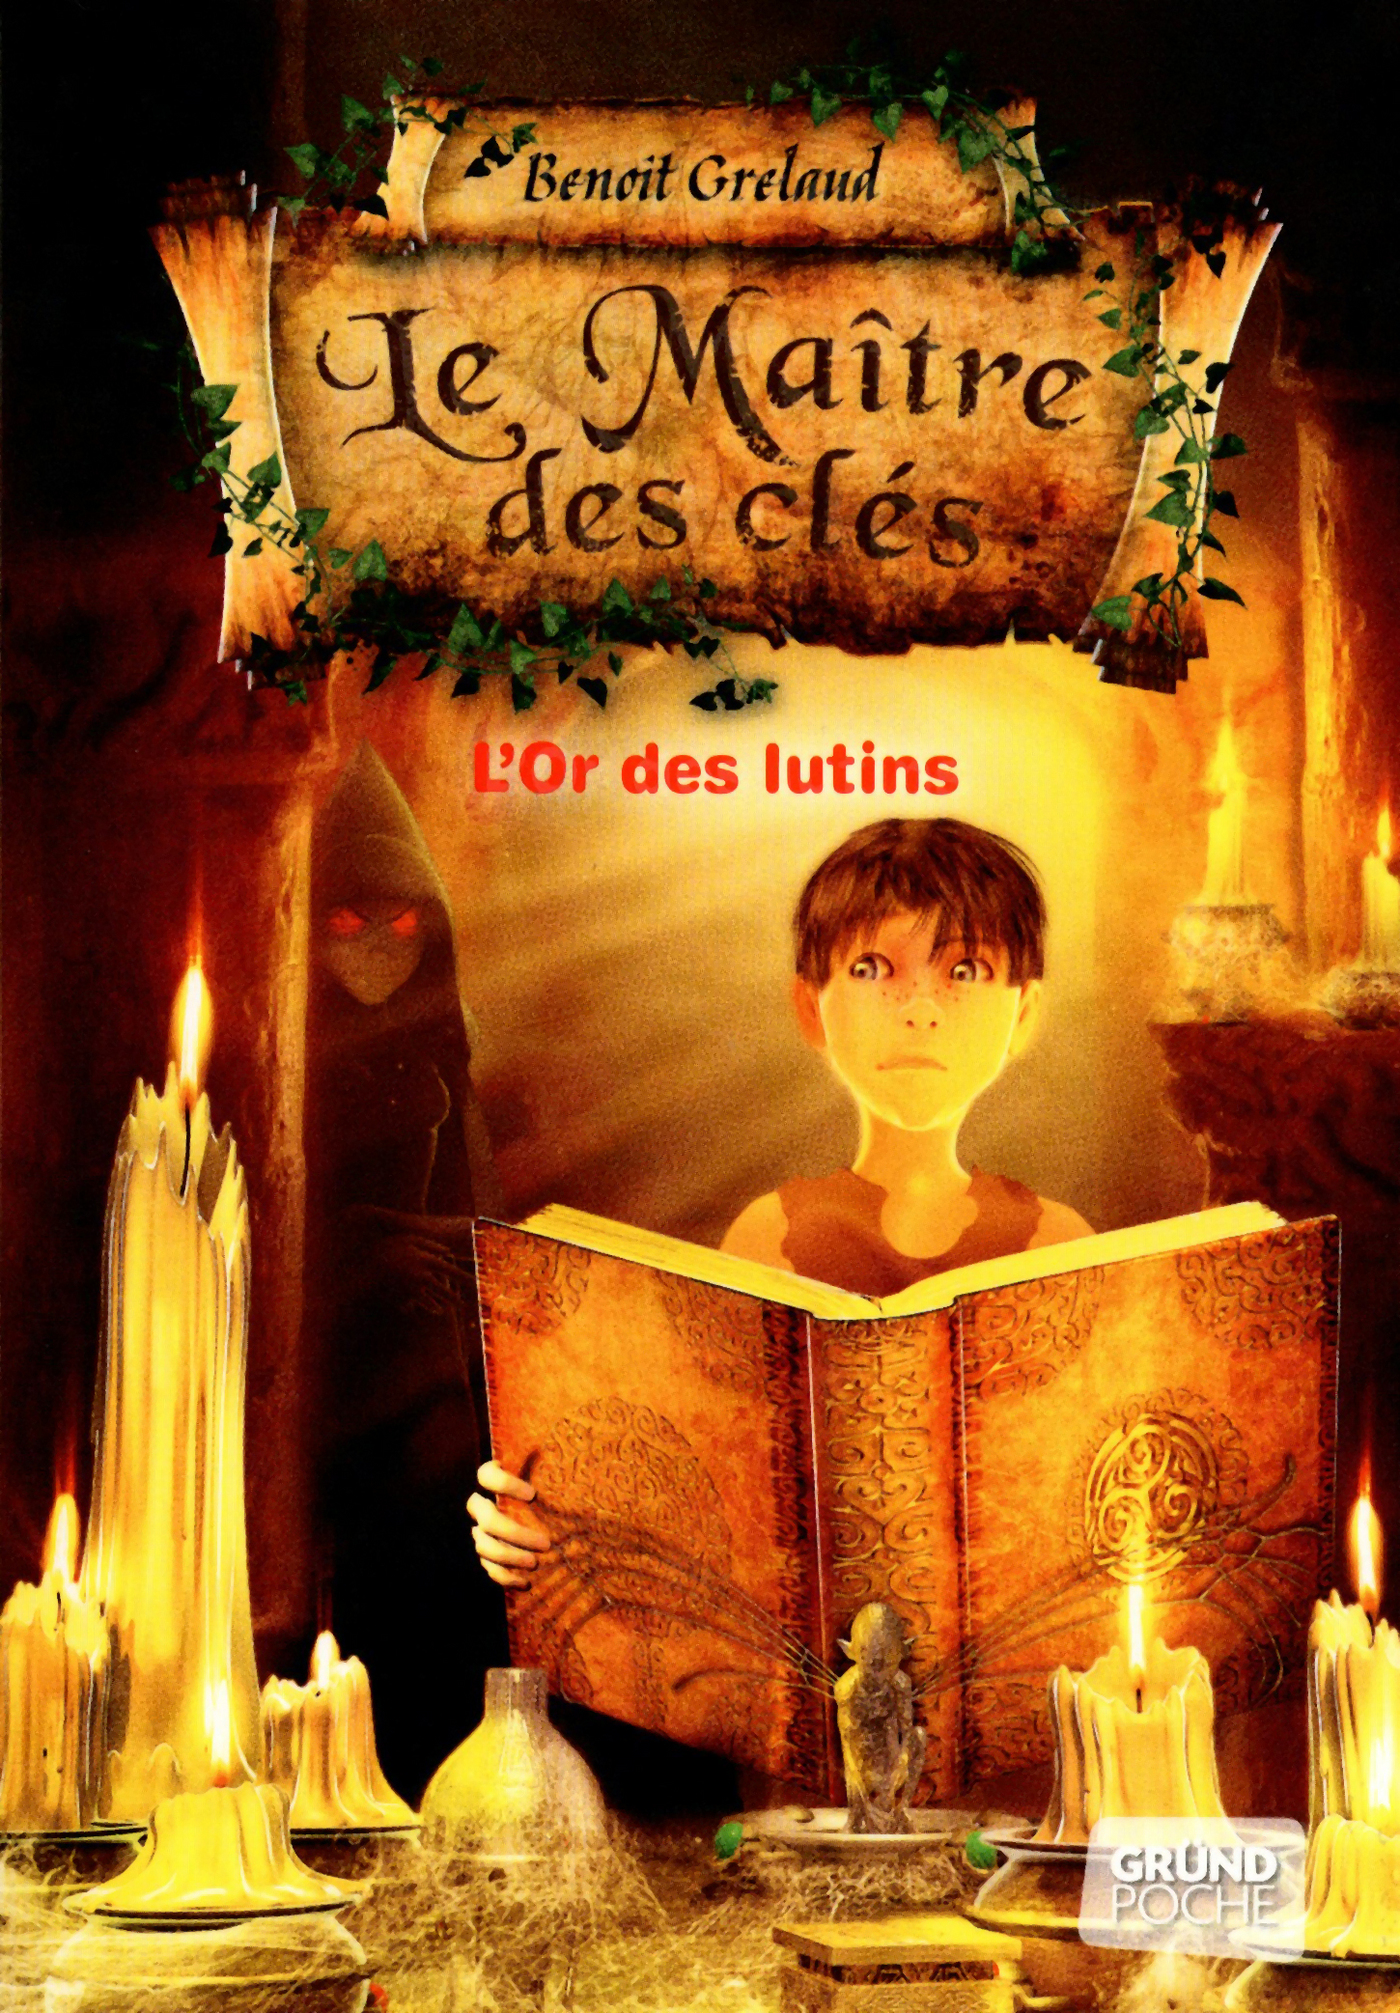 Le Maître des clés, tome 2 - L'or des lutins (ebook)